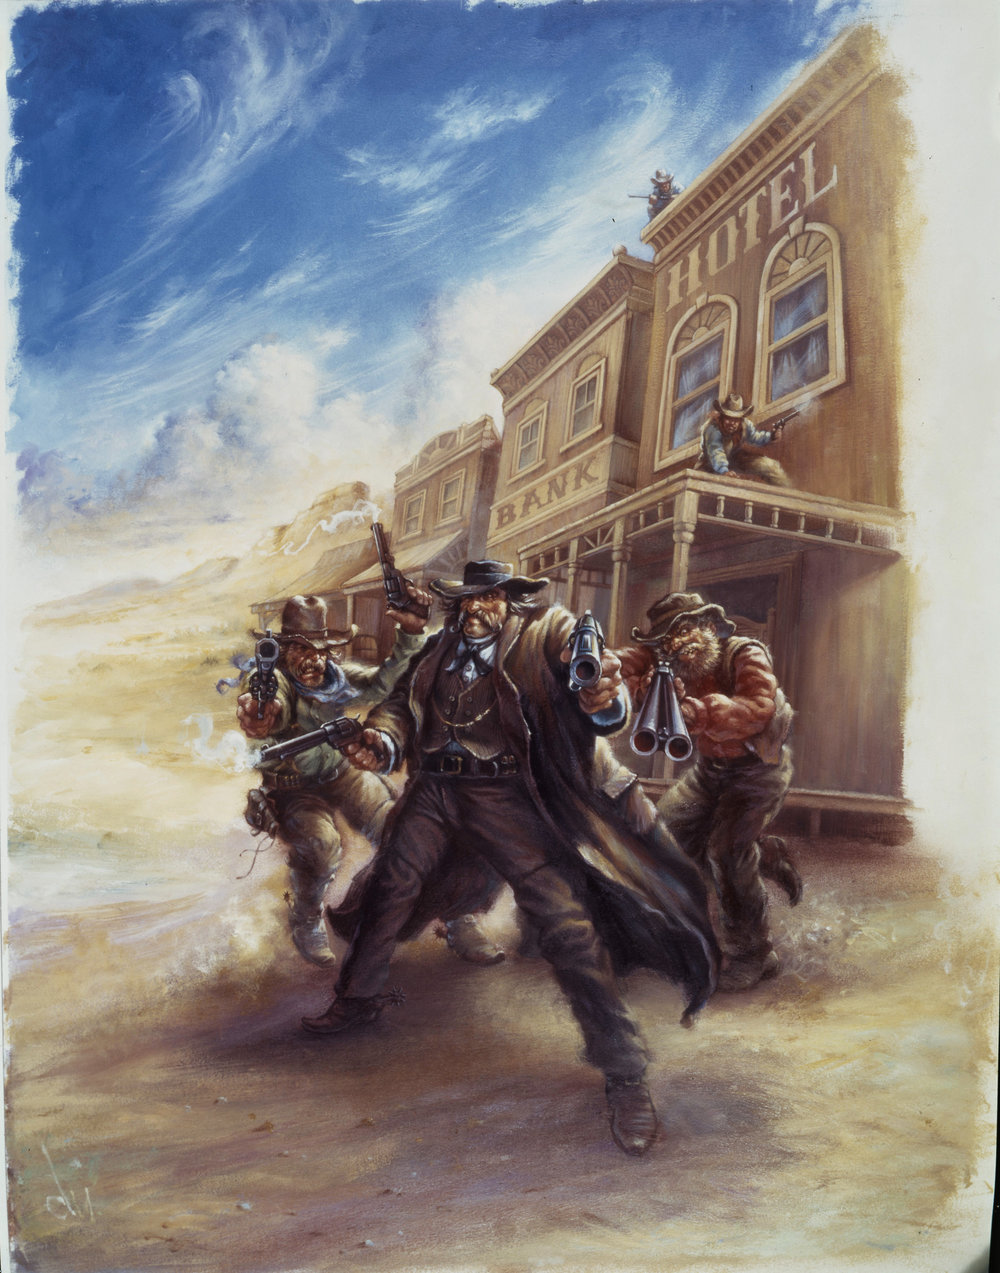 lethal enforcers 2 td.jpg